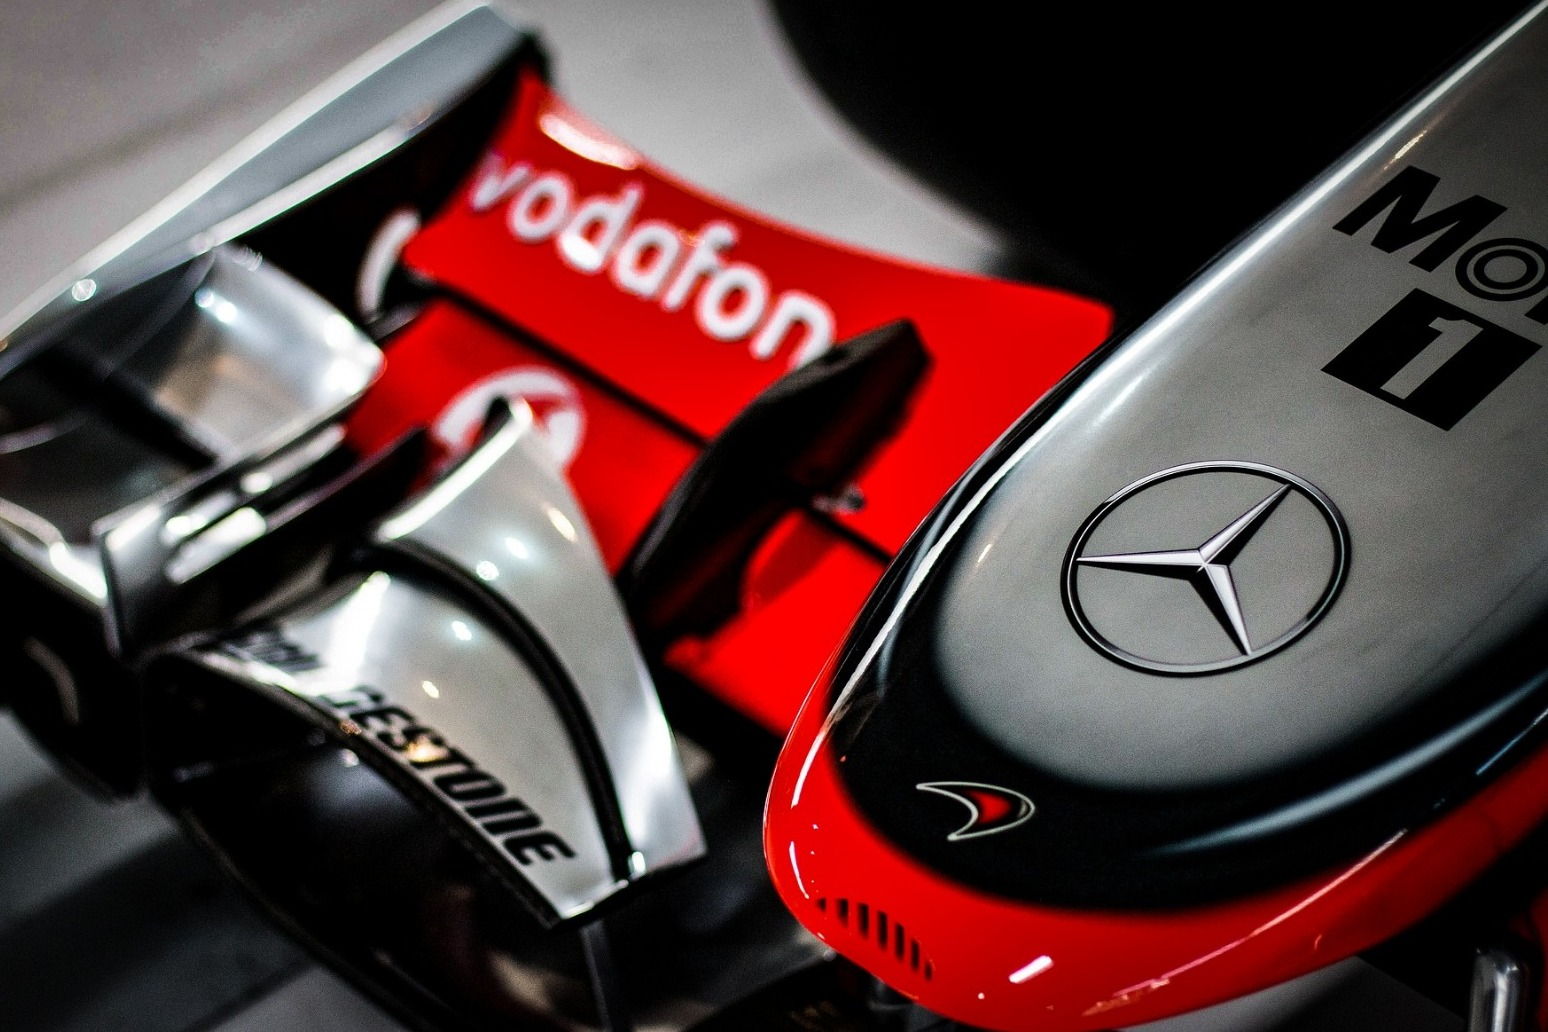 Austrian motor racing great Niki Lauda, who survived fiery crash, dies